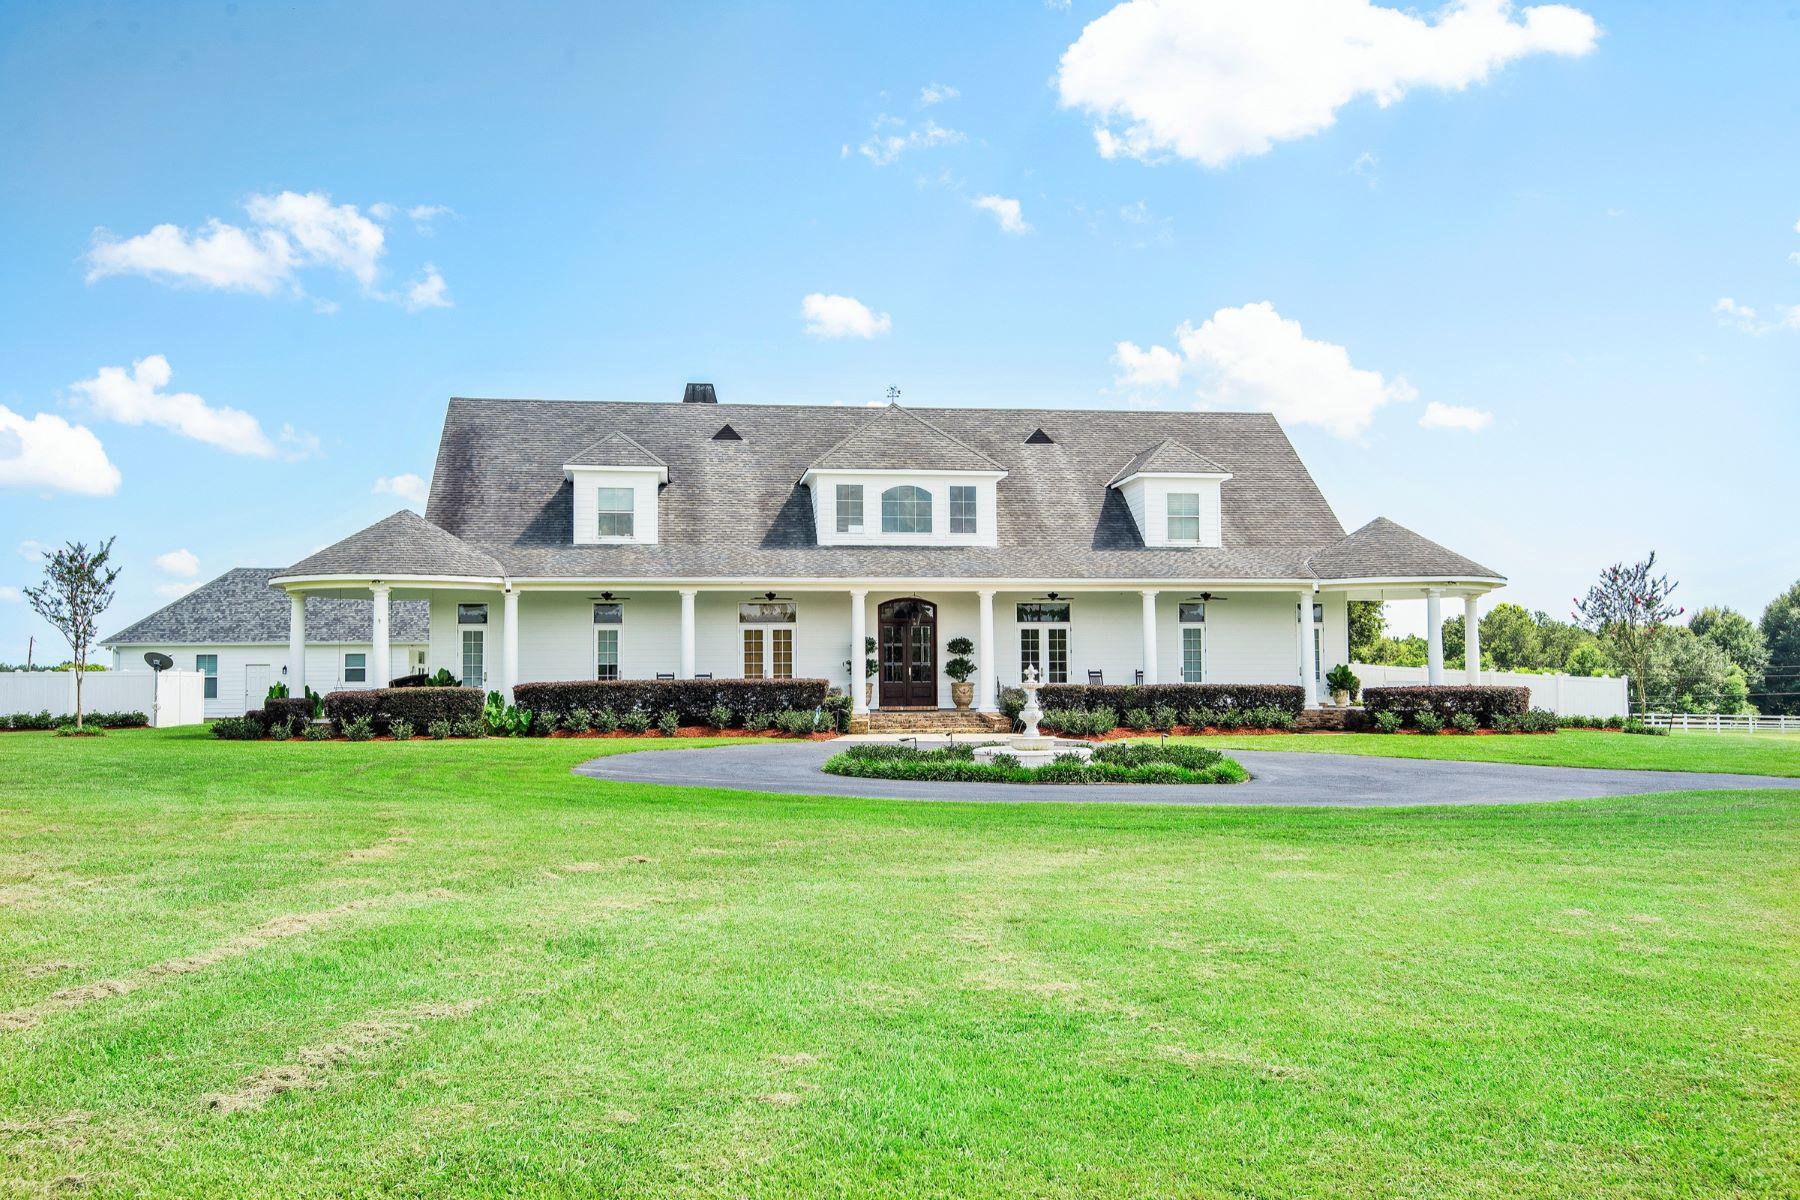 Single Family Homes pour l Vente à 28380 Highway 435, Abita Springs 28380 Hwy 435, Abita Springs, Louisiane 70420 États-Unis